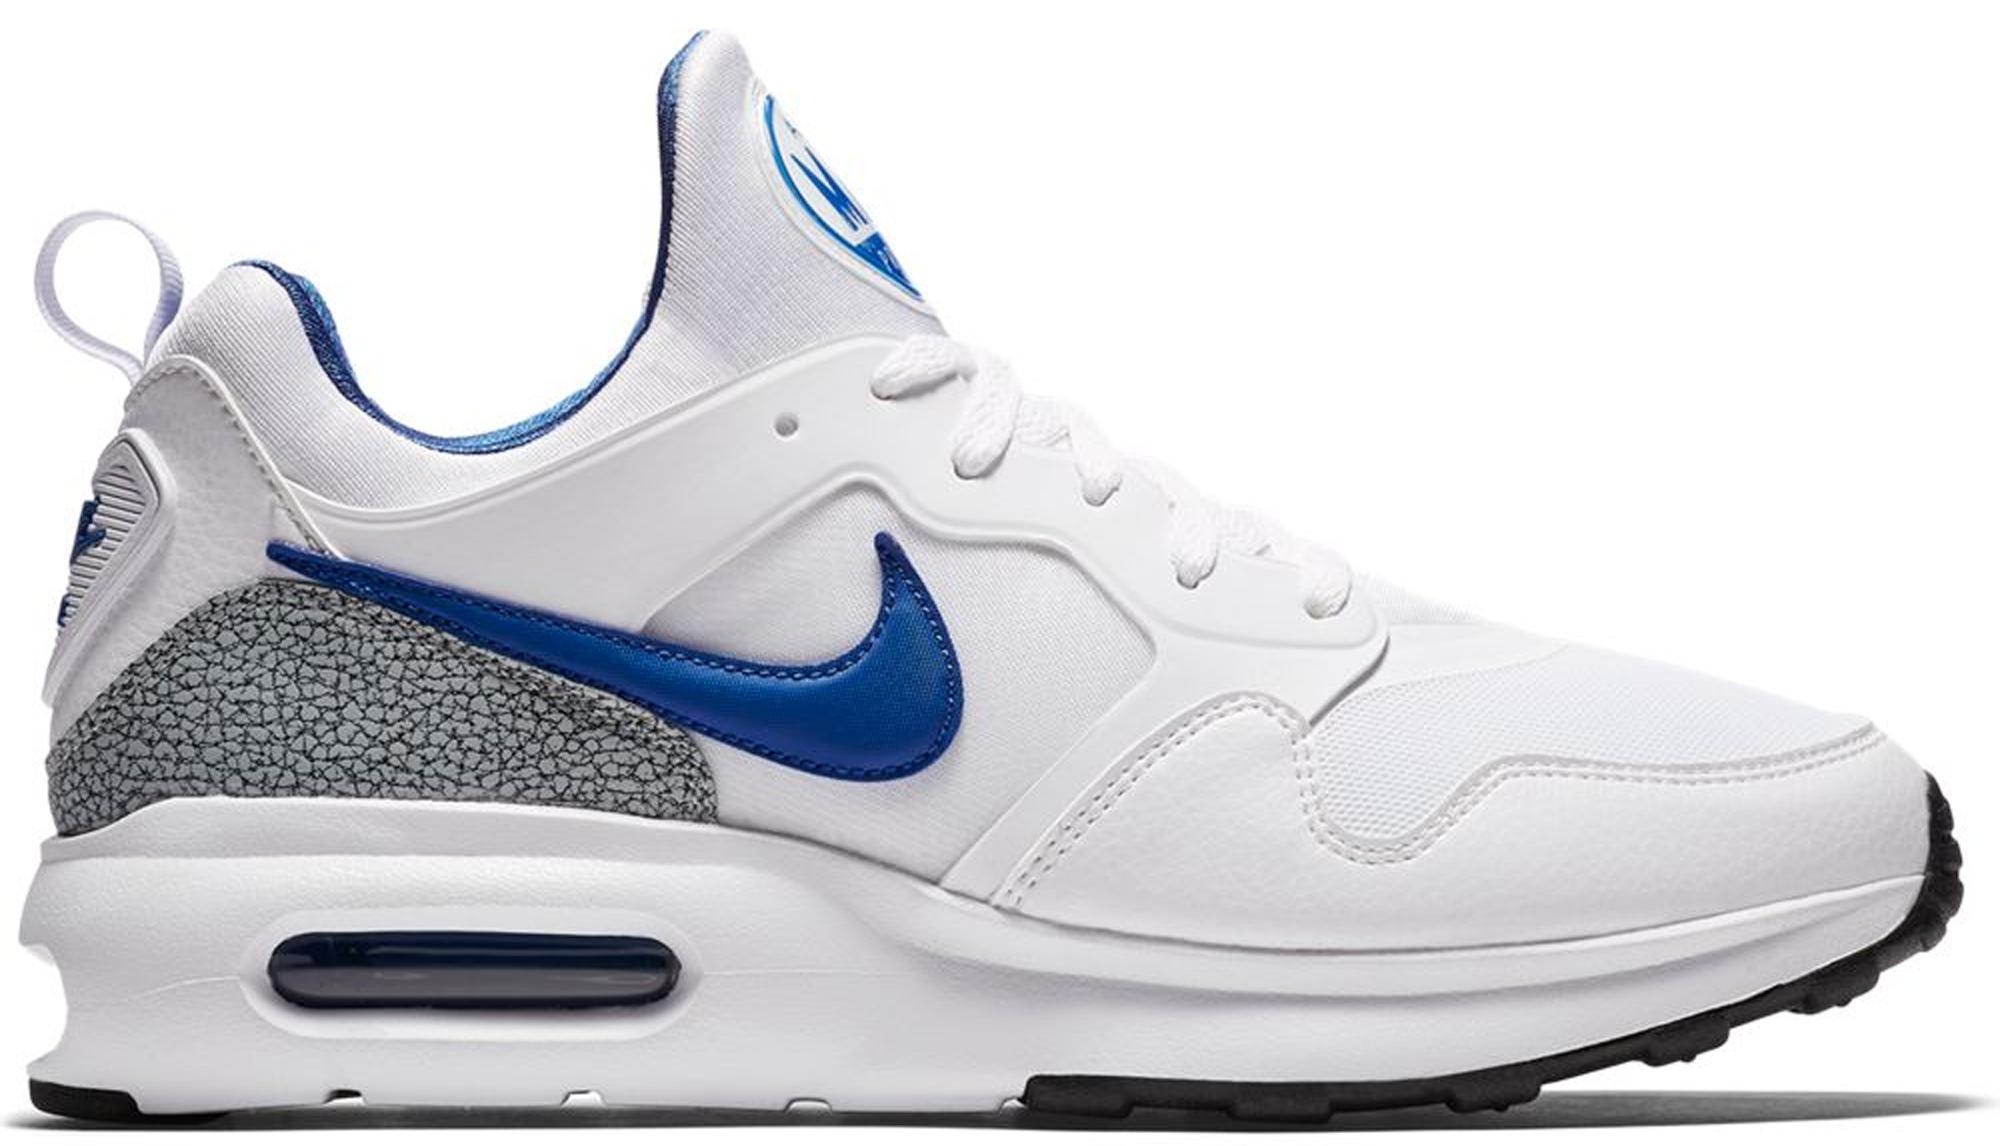 Nike Air Max Prime White International